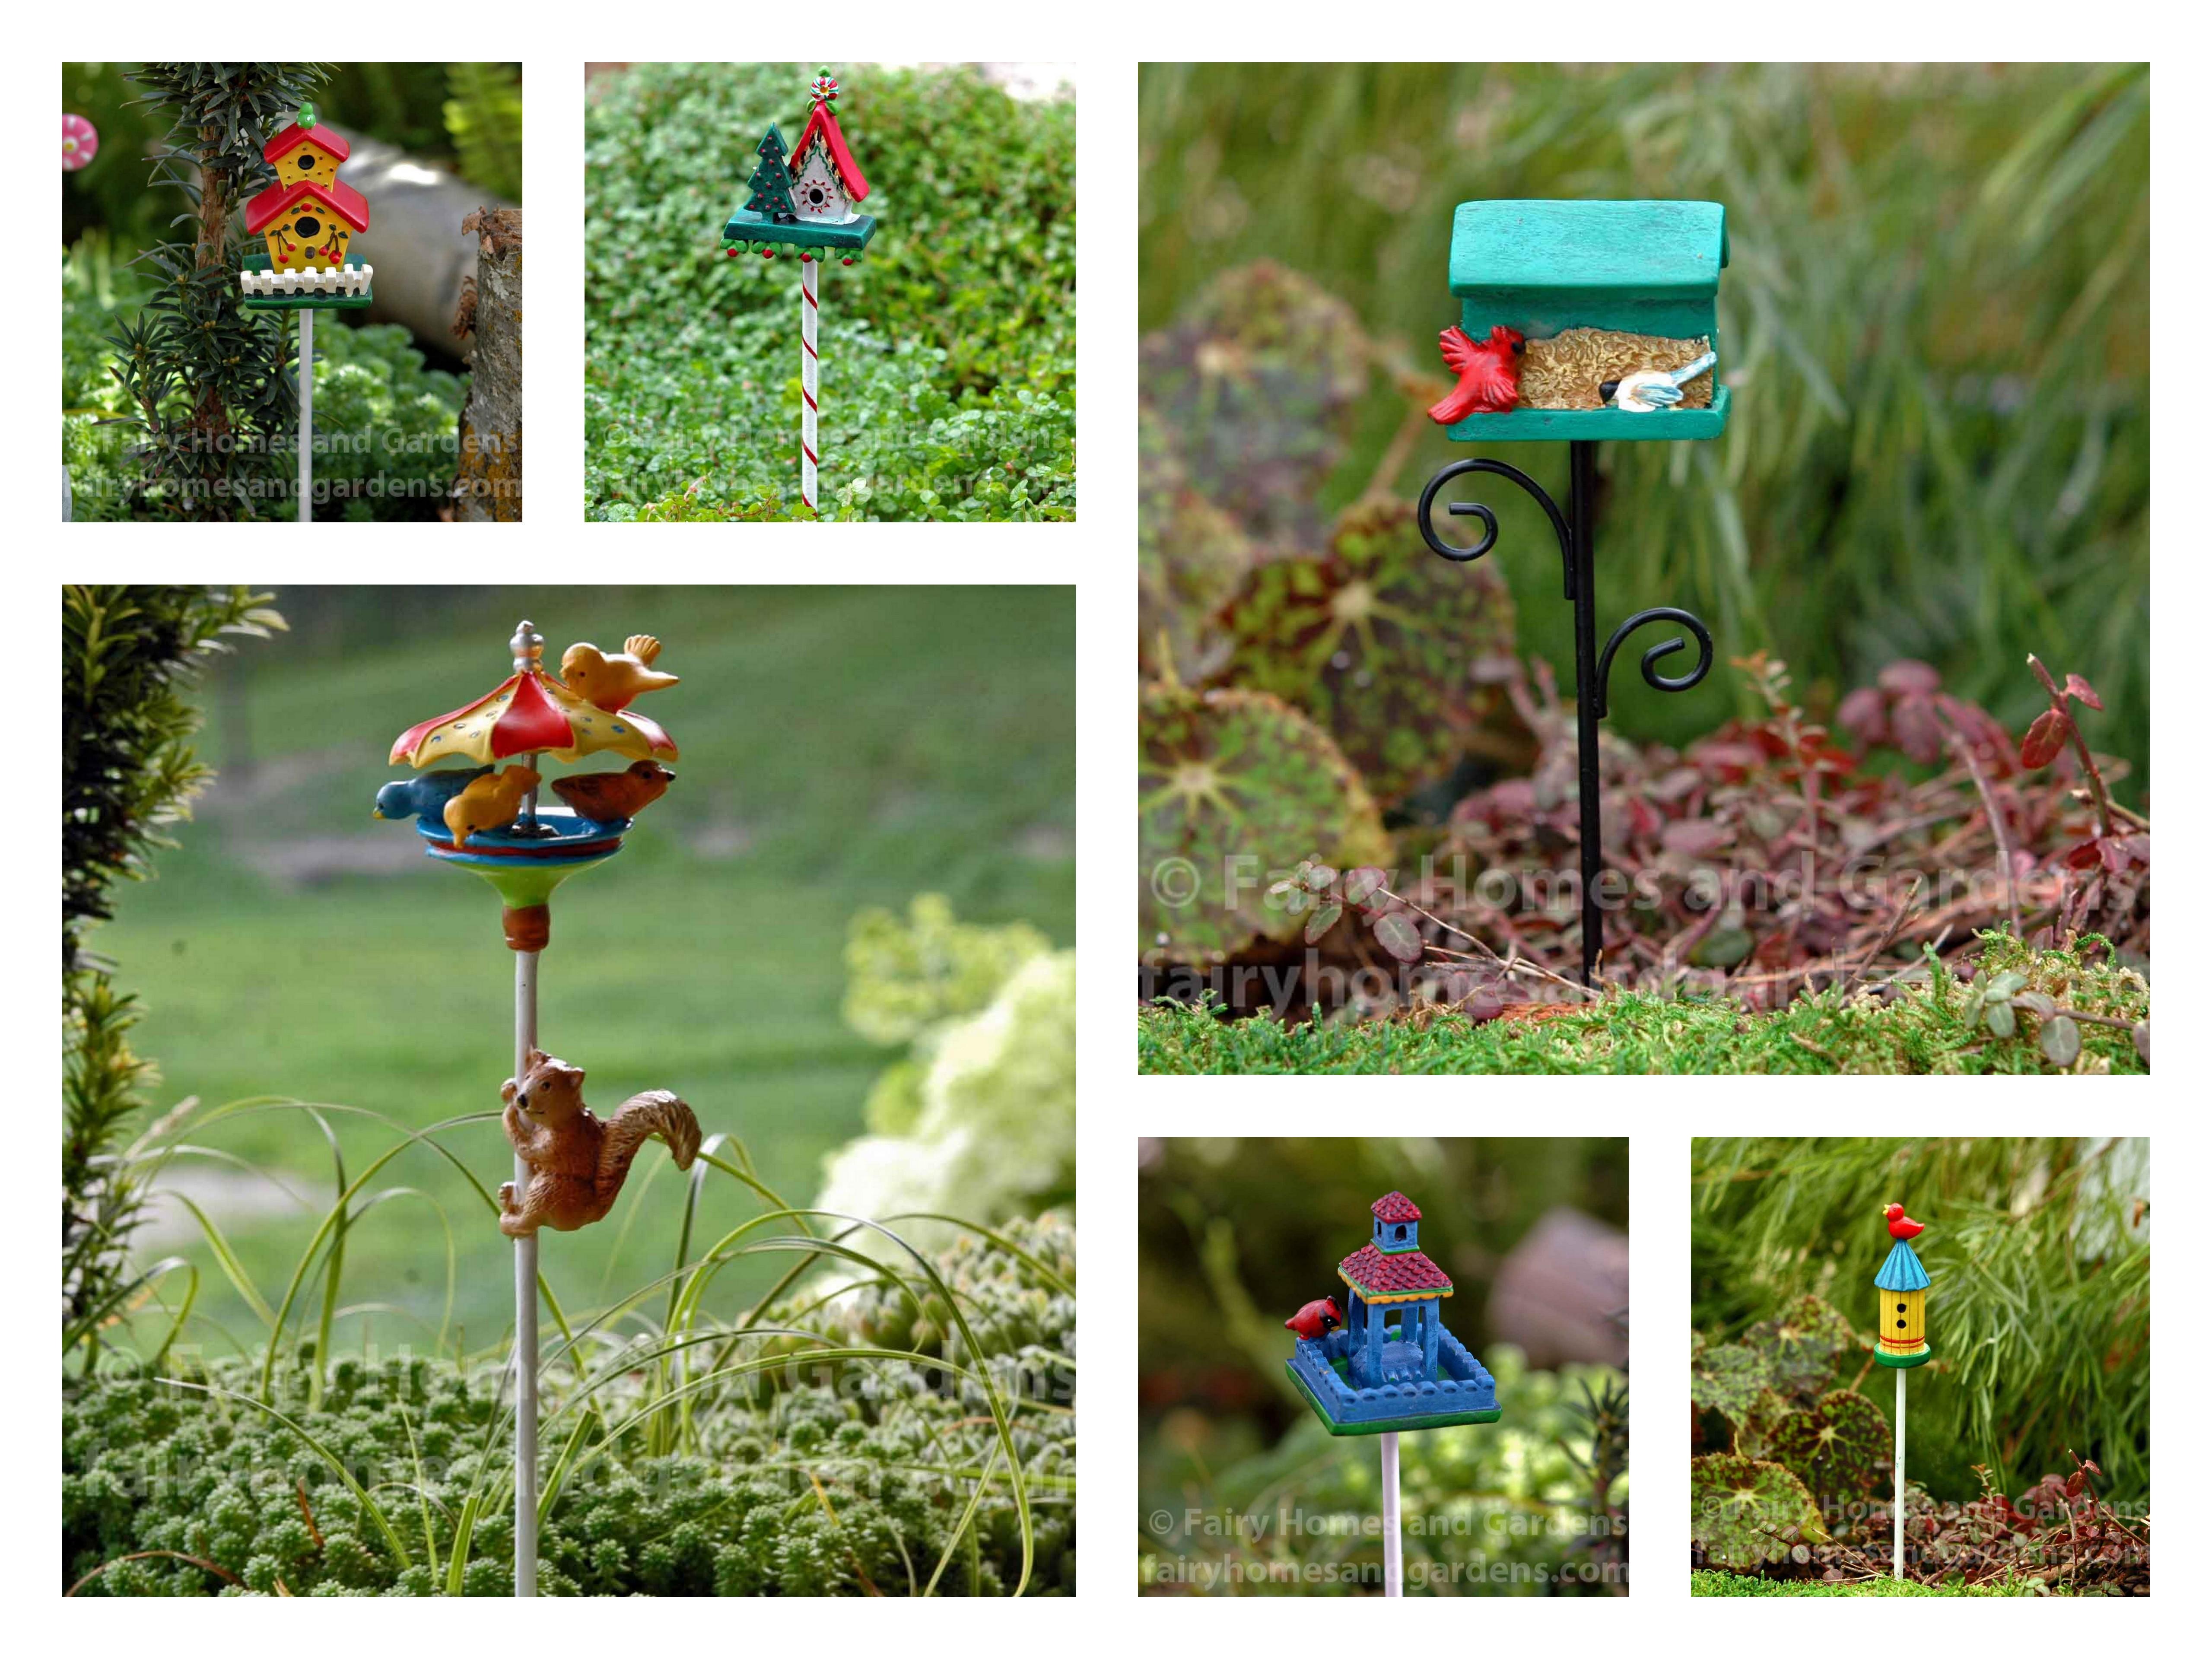 Stocking Stuffers For Fairy Gardeners